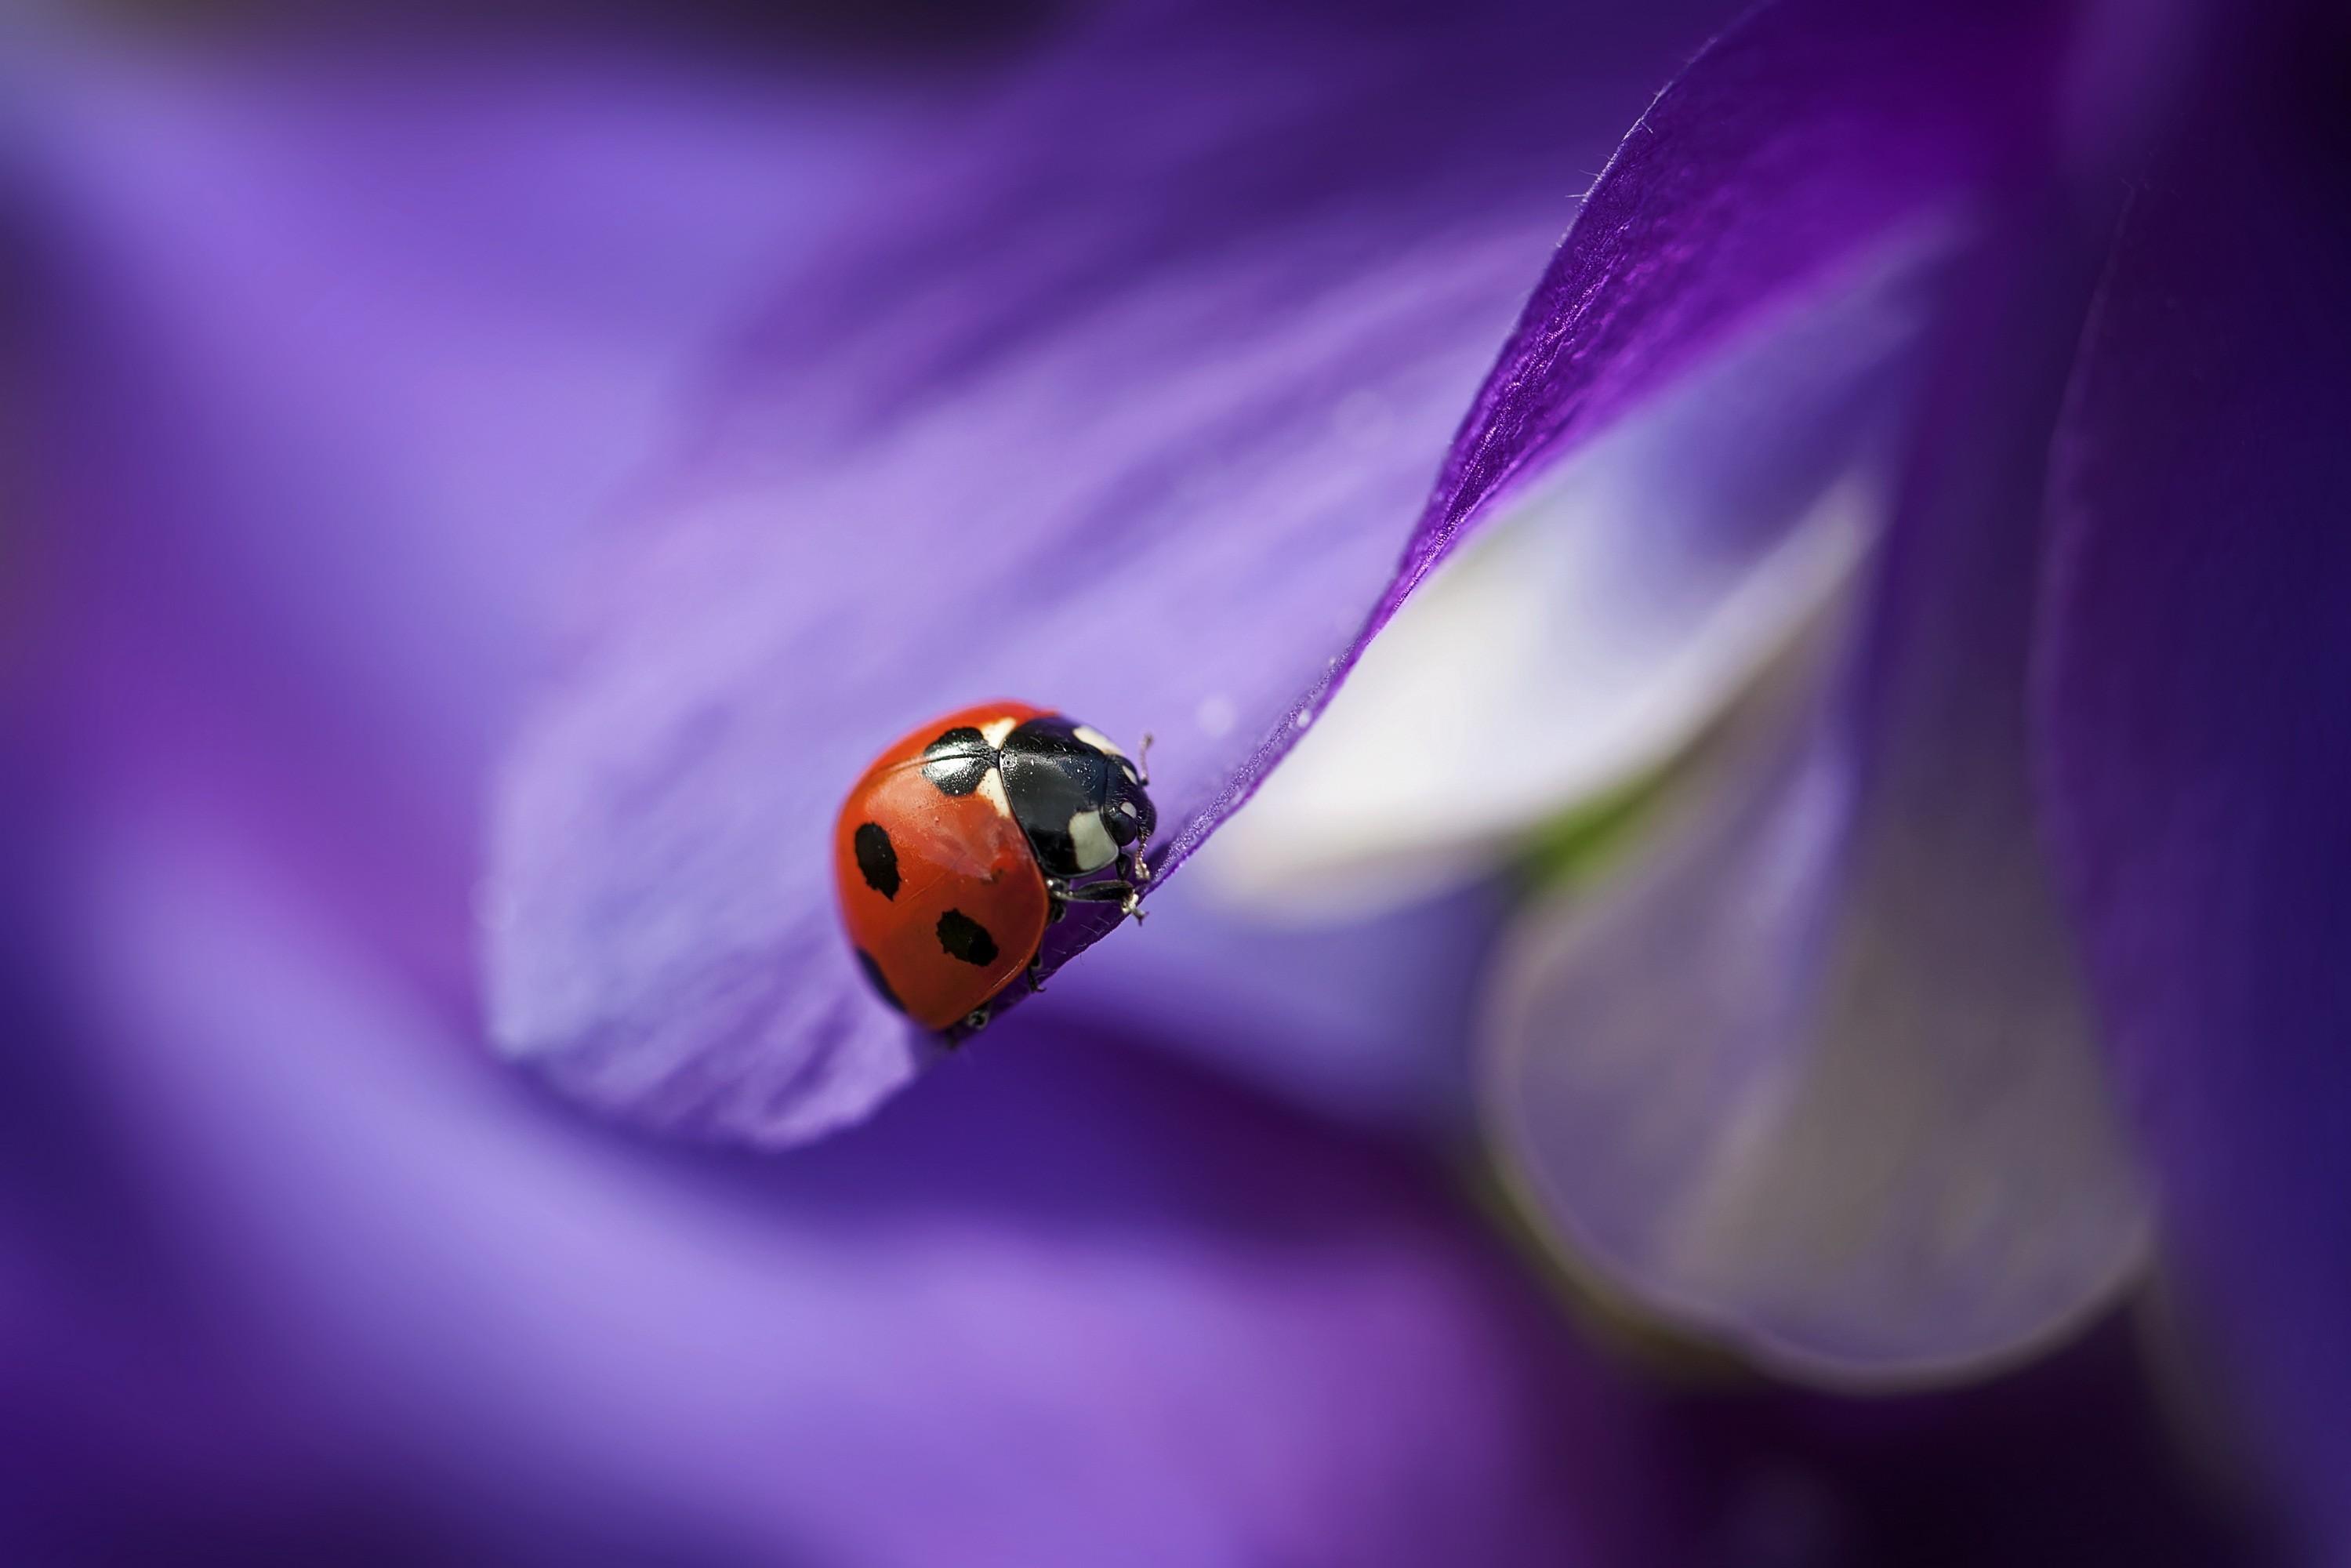 Eyes Of A Dragonfly Nature Dew Cute Macro Hd Wallpaper: Wallpaper Ladybug, Macro, Blur, Purple, Animals #4512